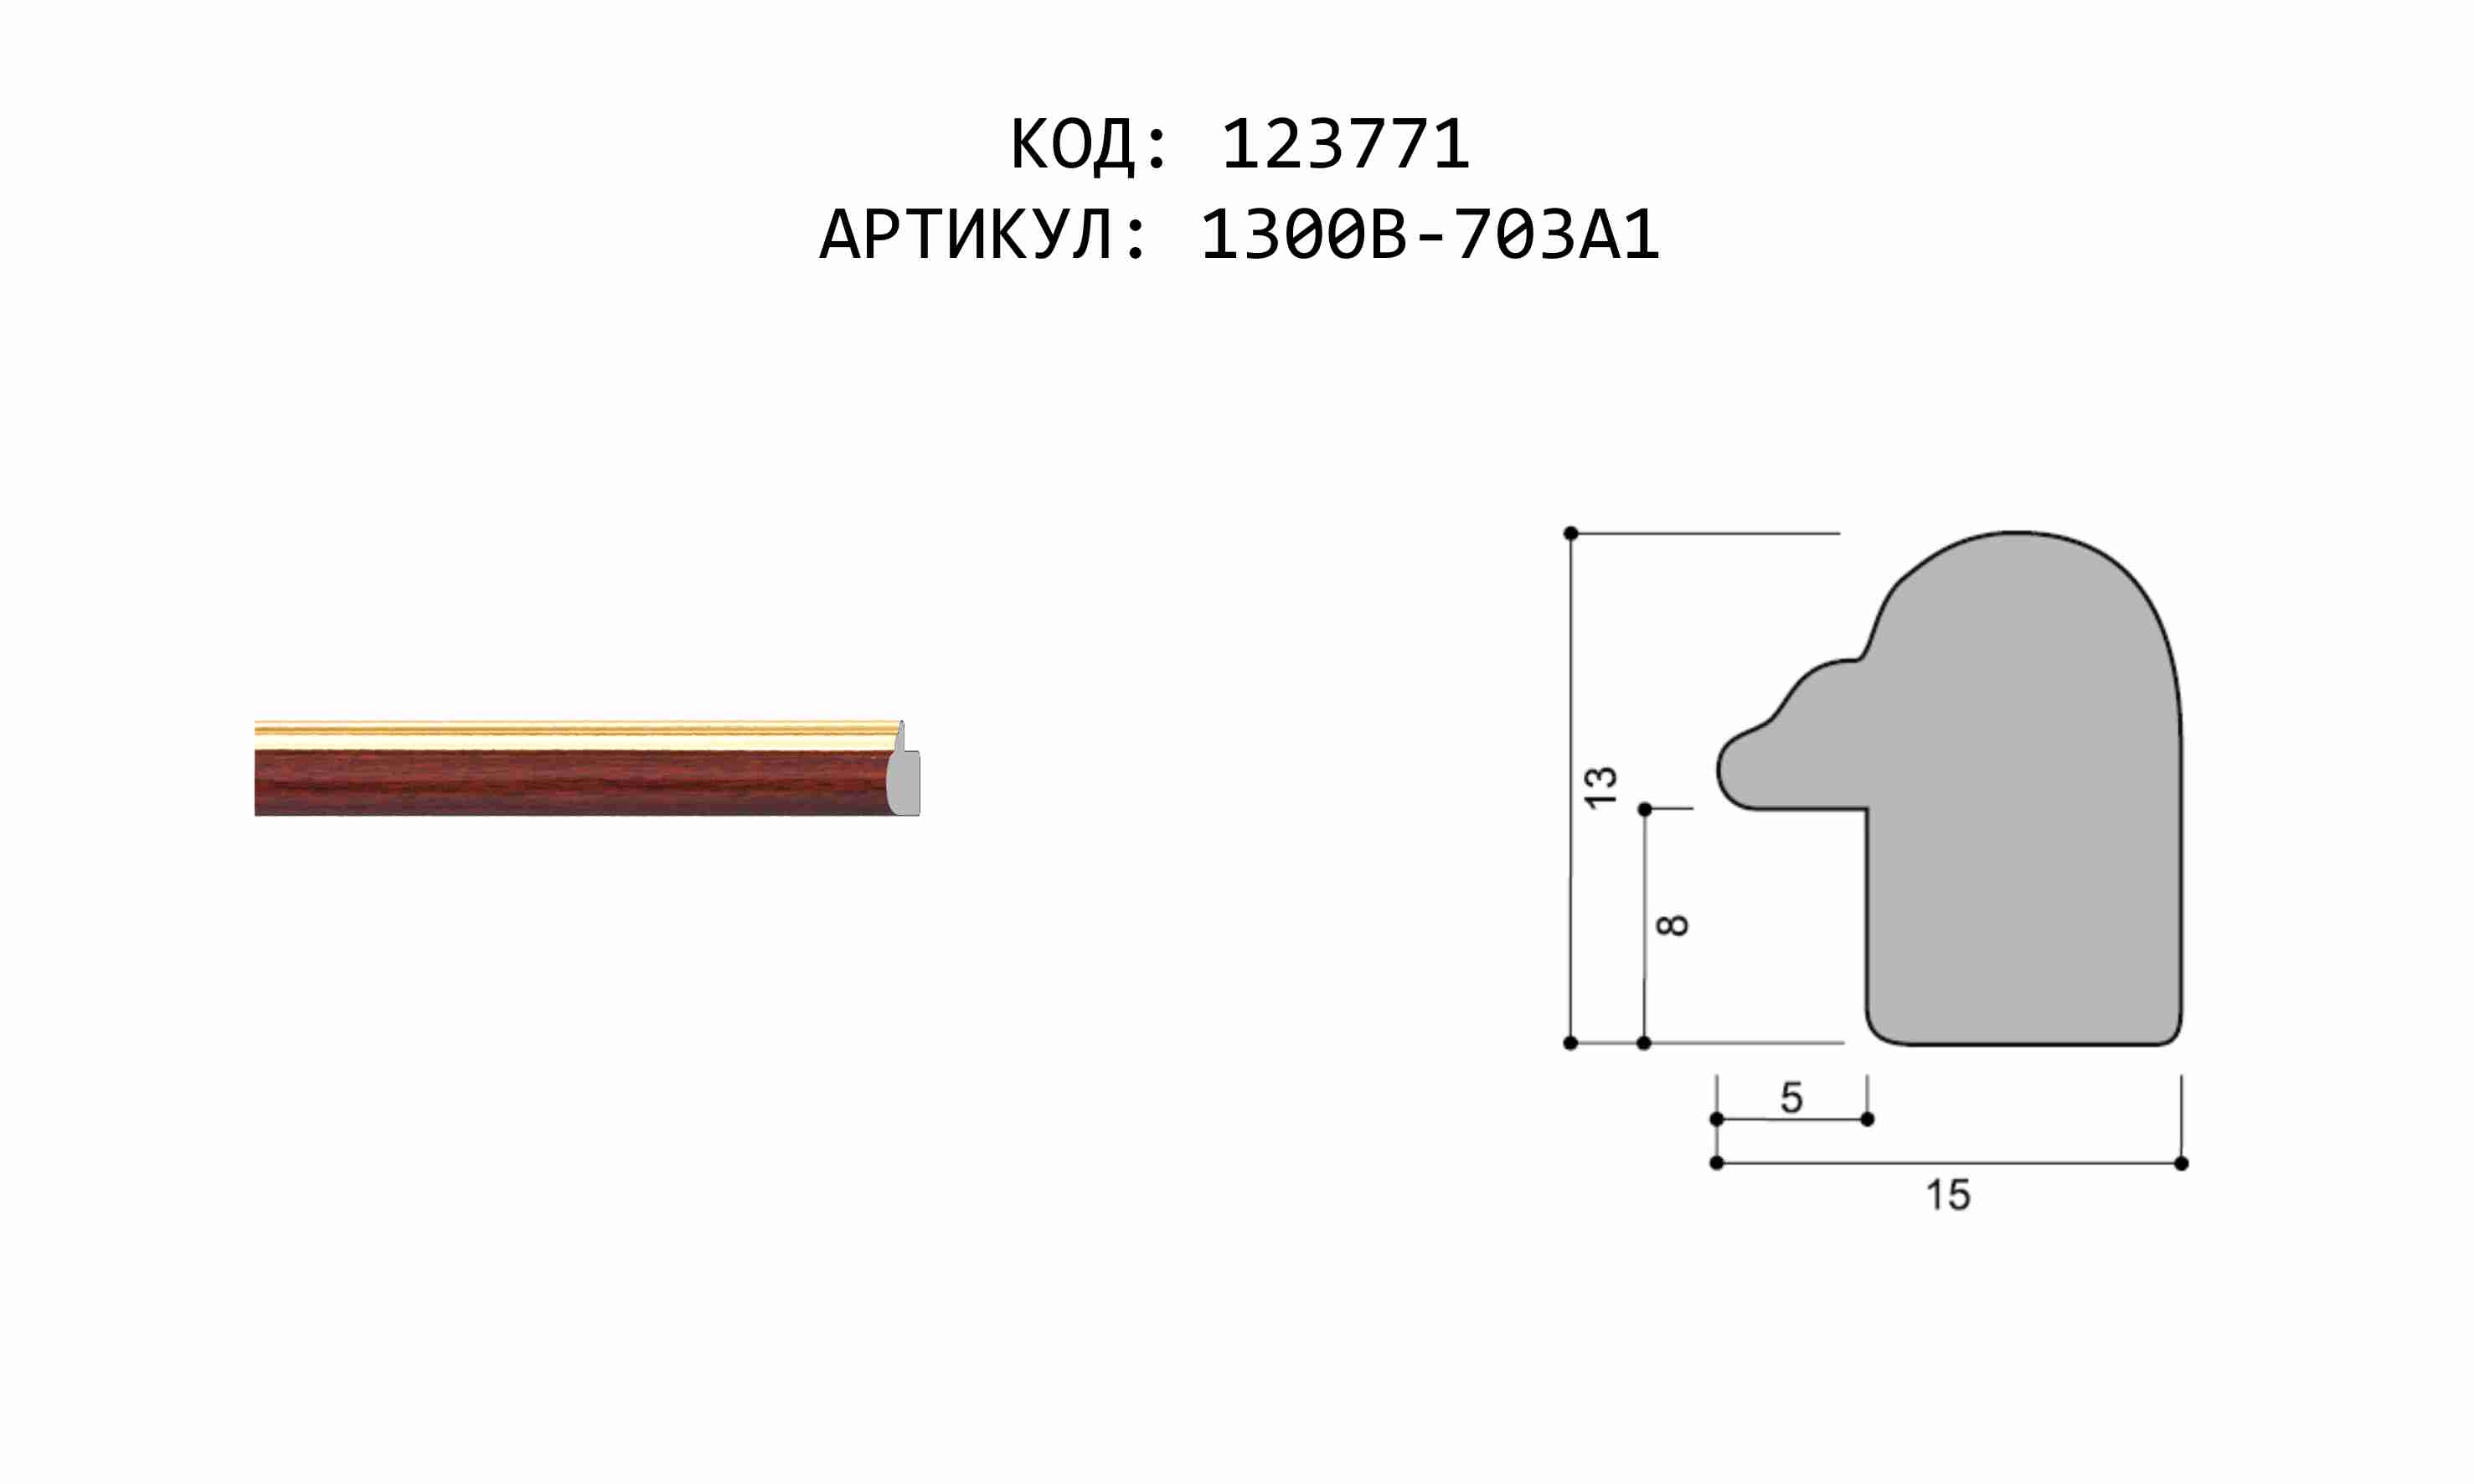 Артикул: 1300B-703A1